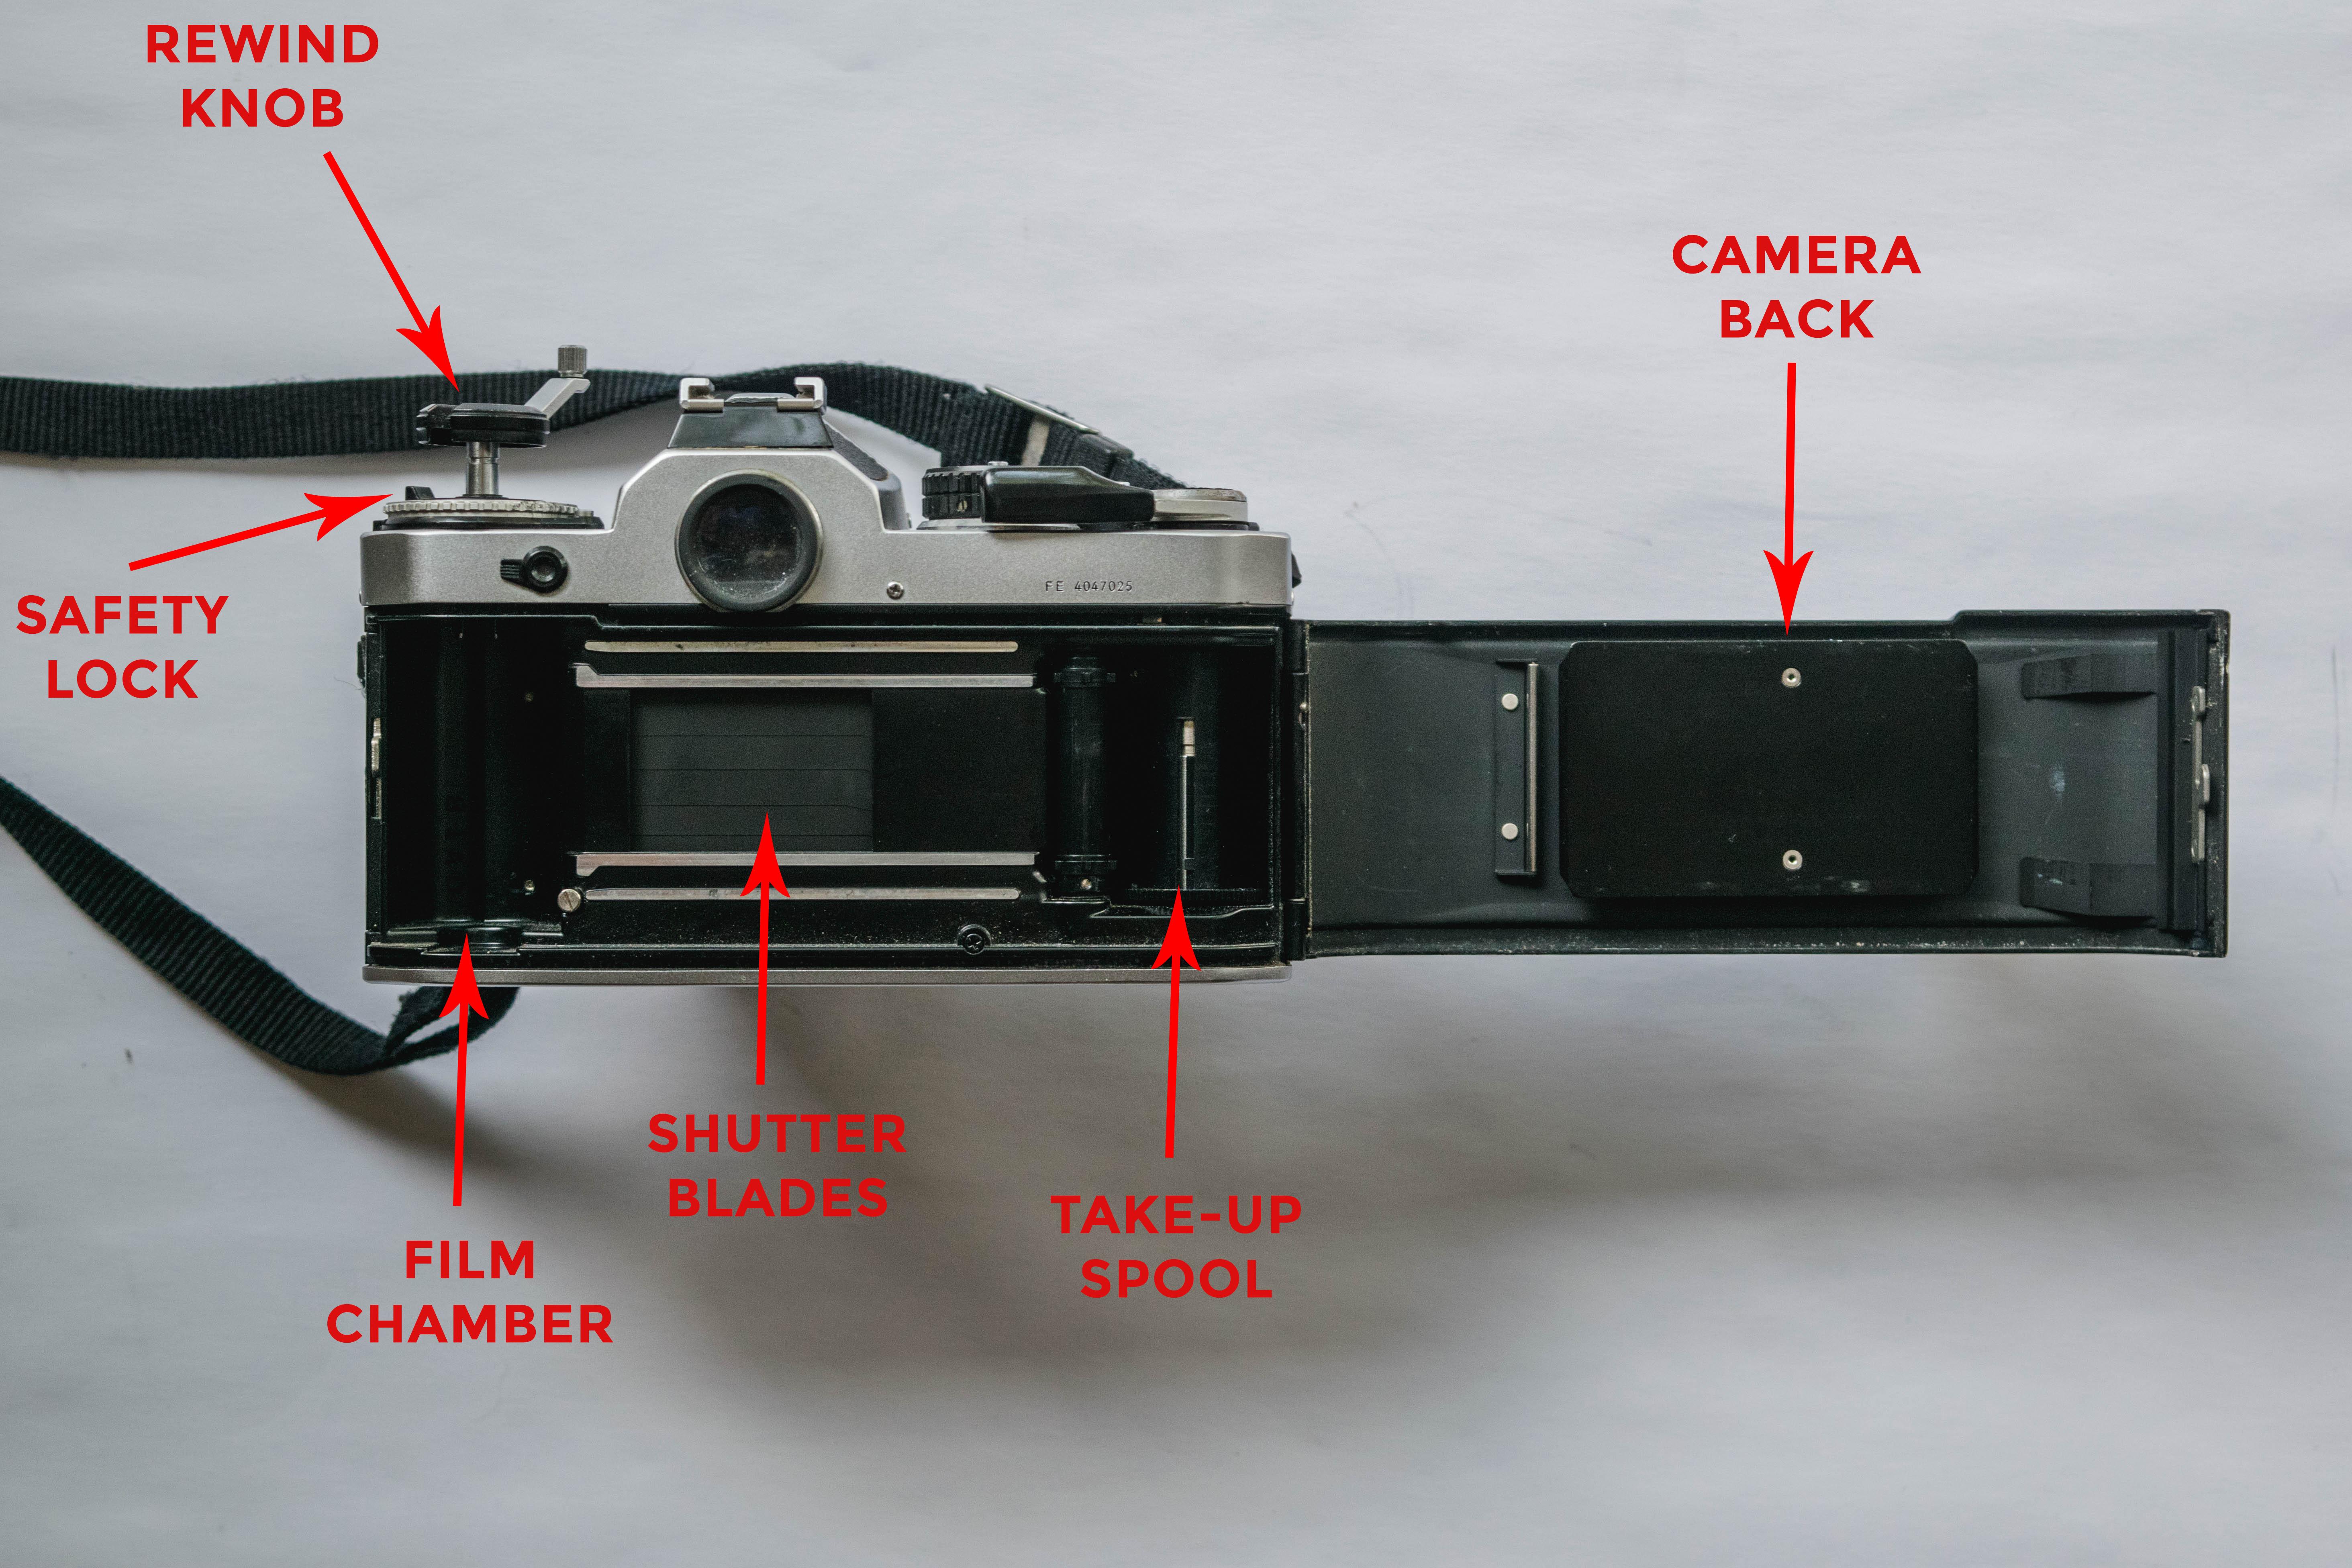 Diagram - How to Load Film into a 35mm Film Camera - FilterGrade Blog